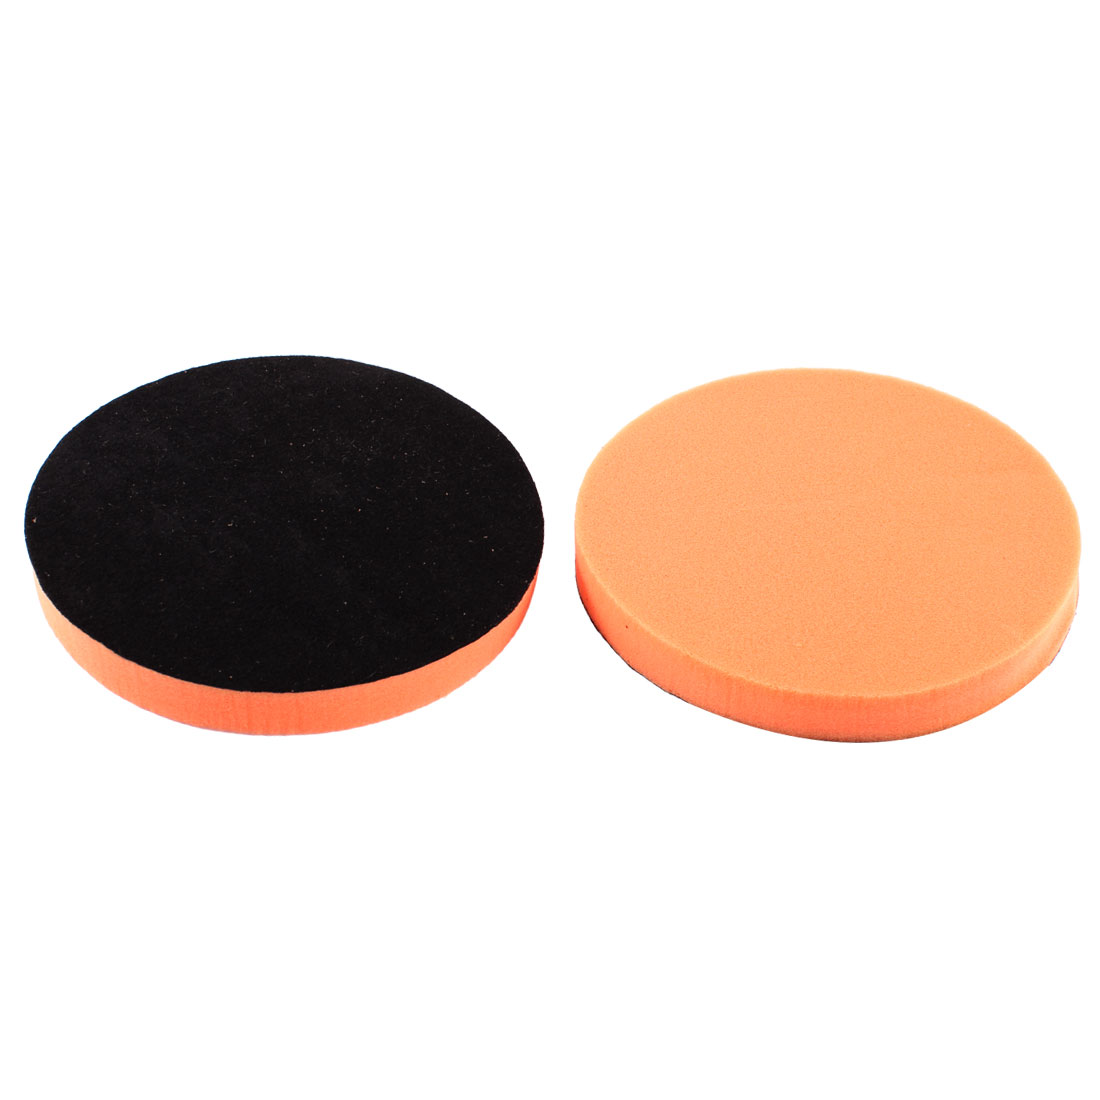 "2 Pcs 7"" Diameter Car Auto Round Polishing Sponge Cleaning Pads Orange"